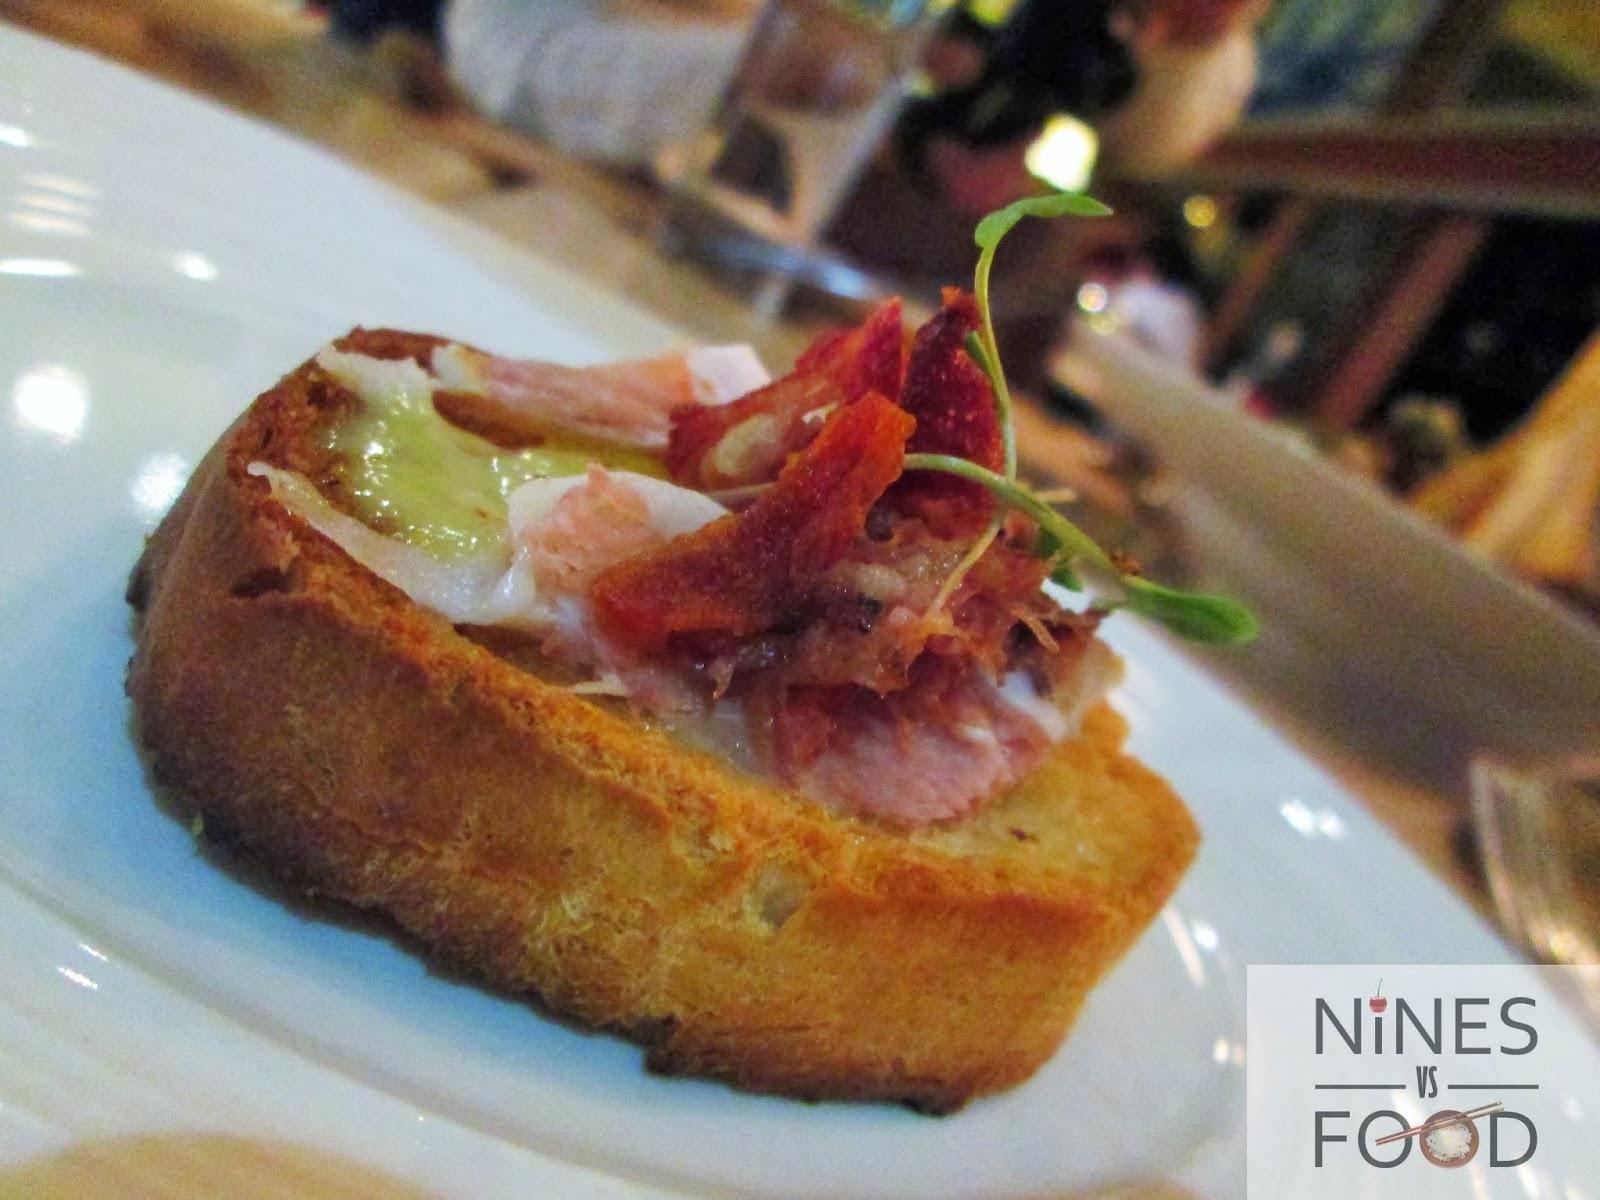 Nines vs. Food - Olive Tree Kitchen and Bar-14.jpg